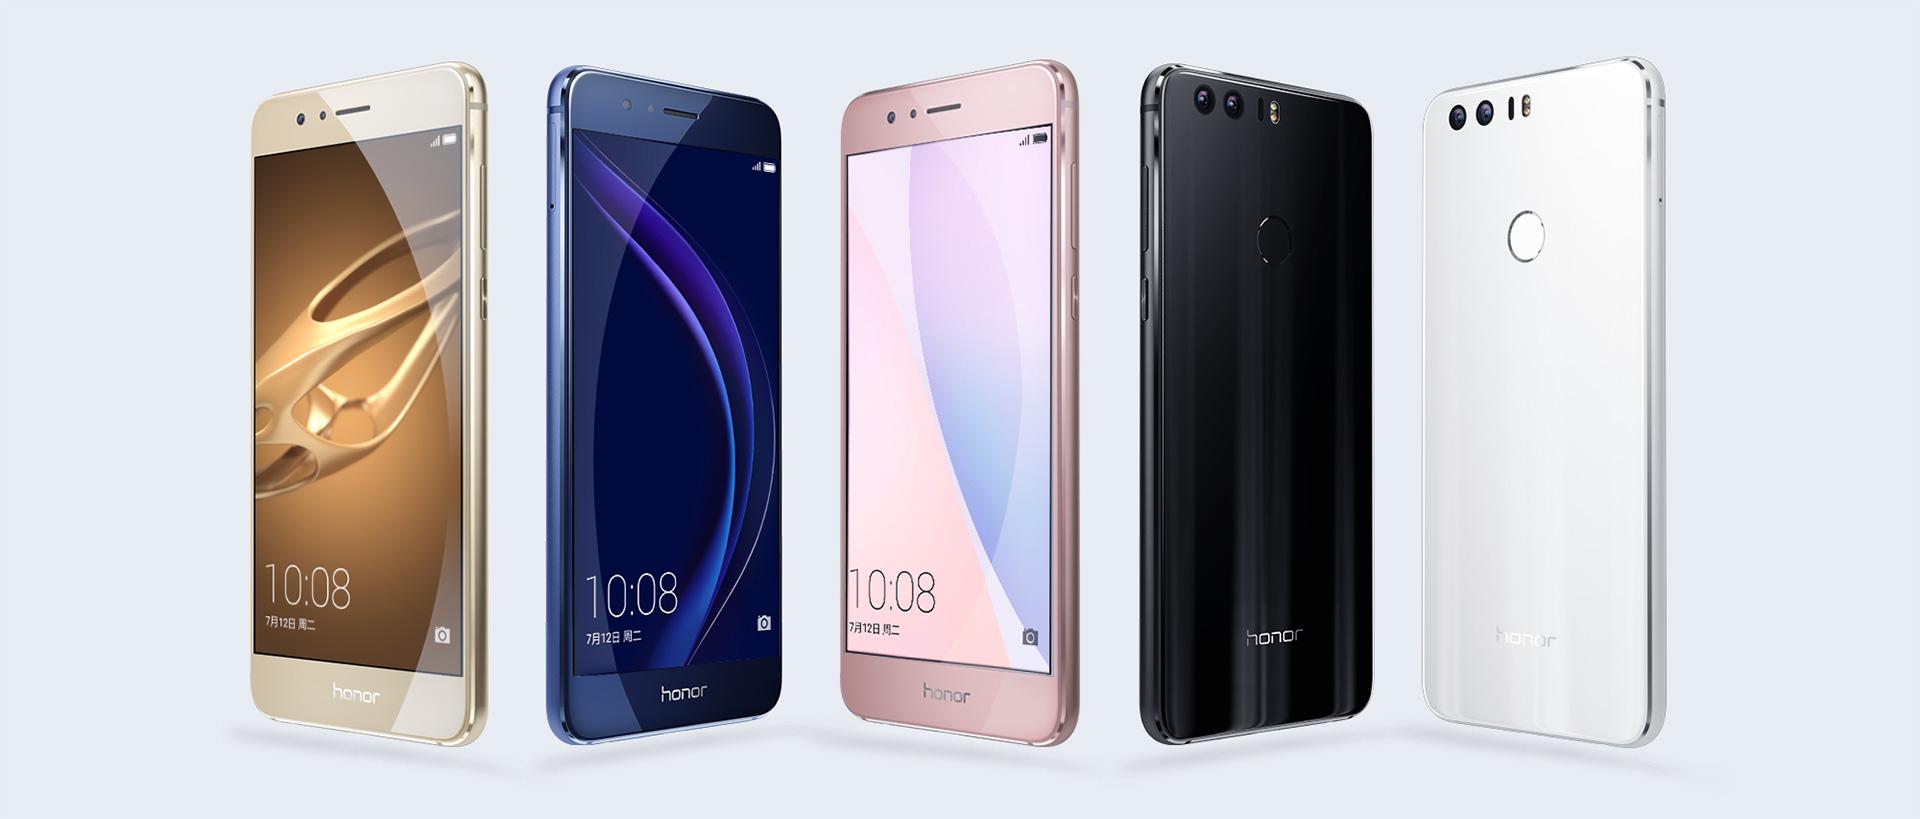 Huawei、デュアルカメラ搭載「Honor 8」を発表